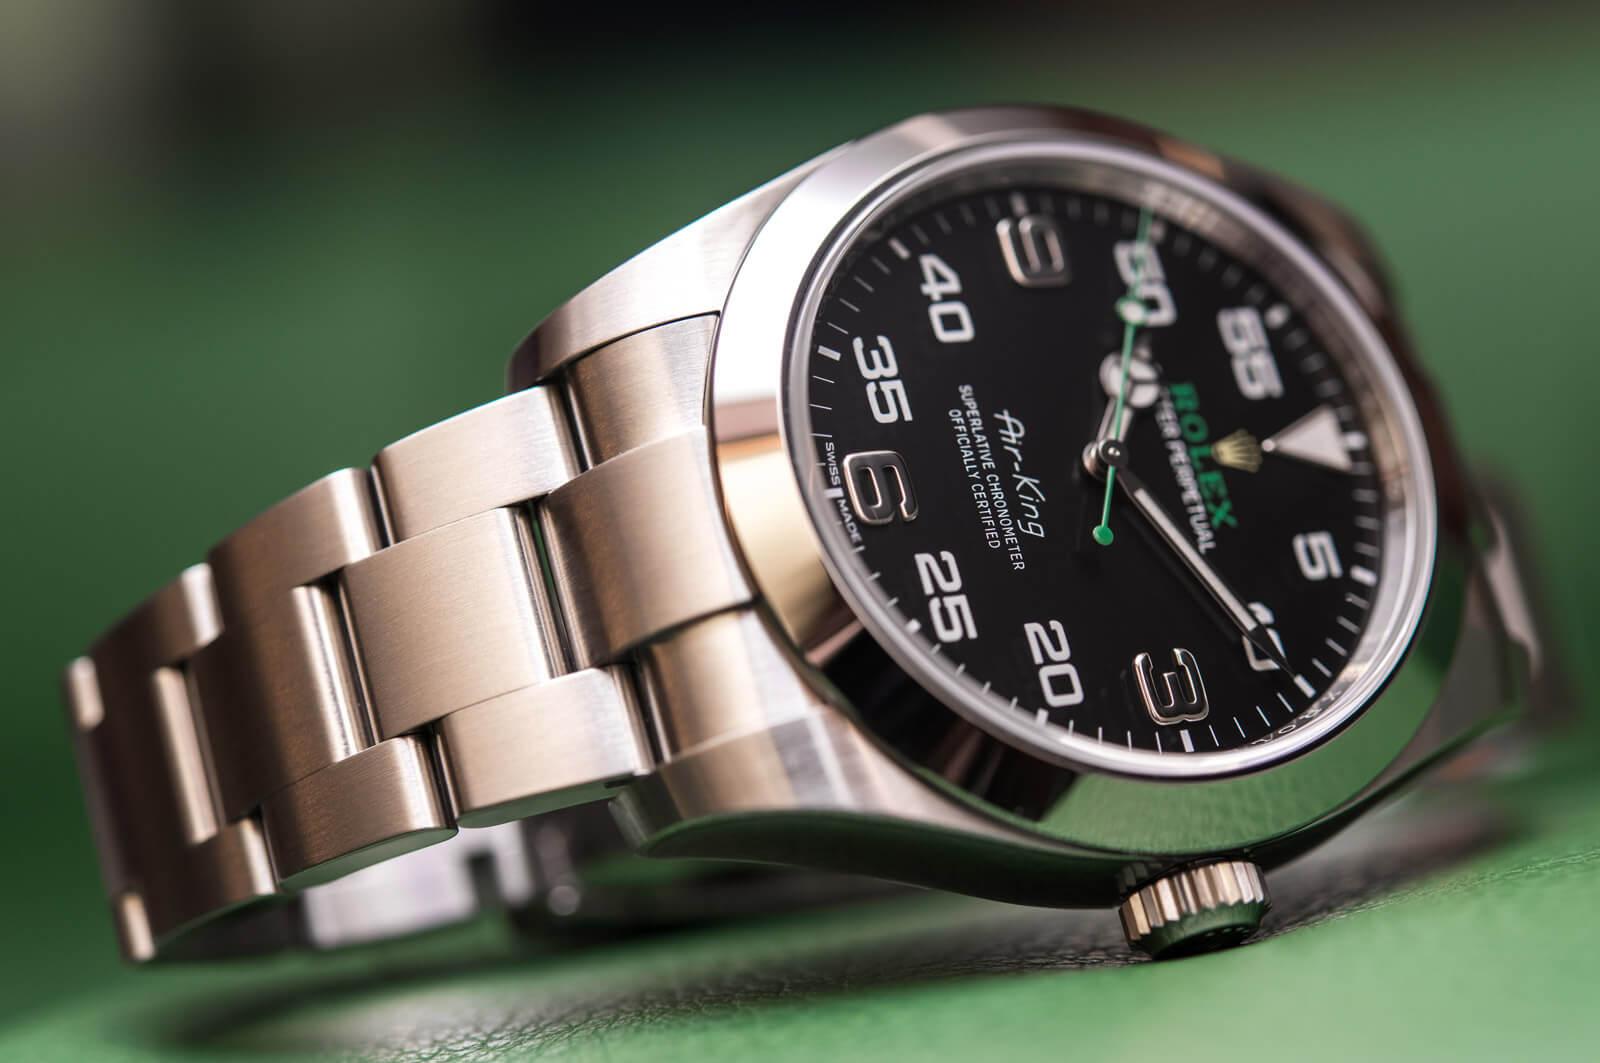 af48f6178d0 Rolex Air-King - News - Timepieces - Rolex Boutique Belgrade